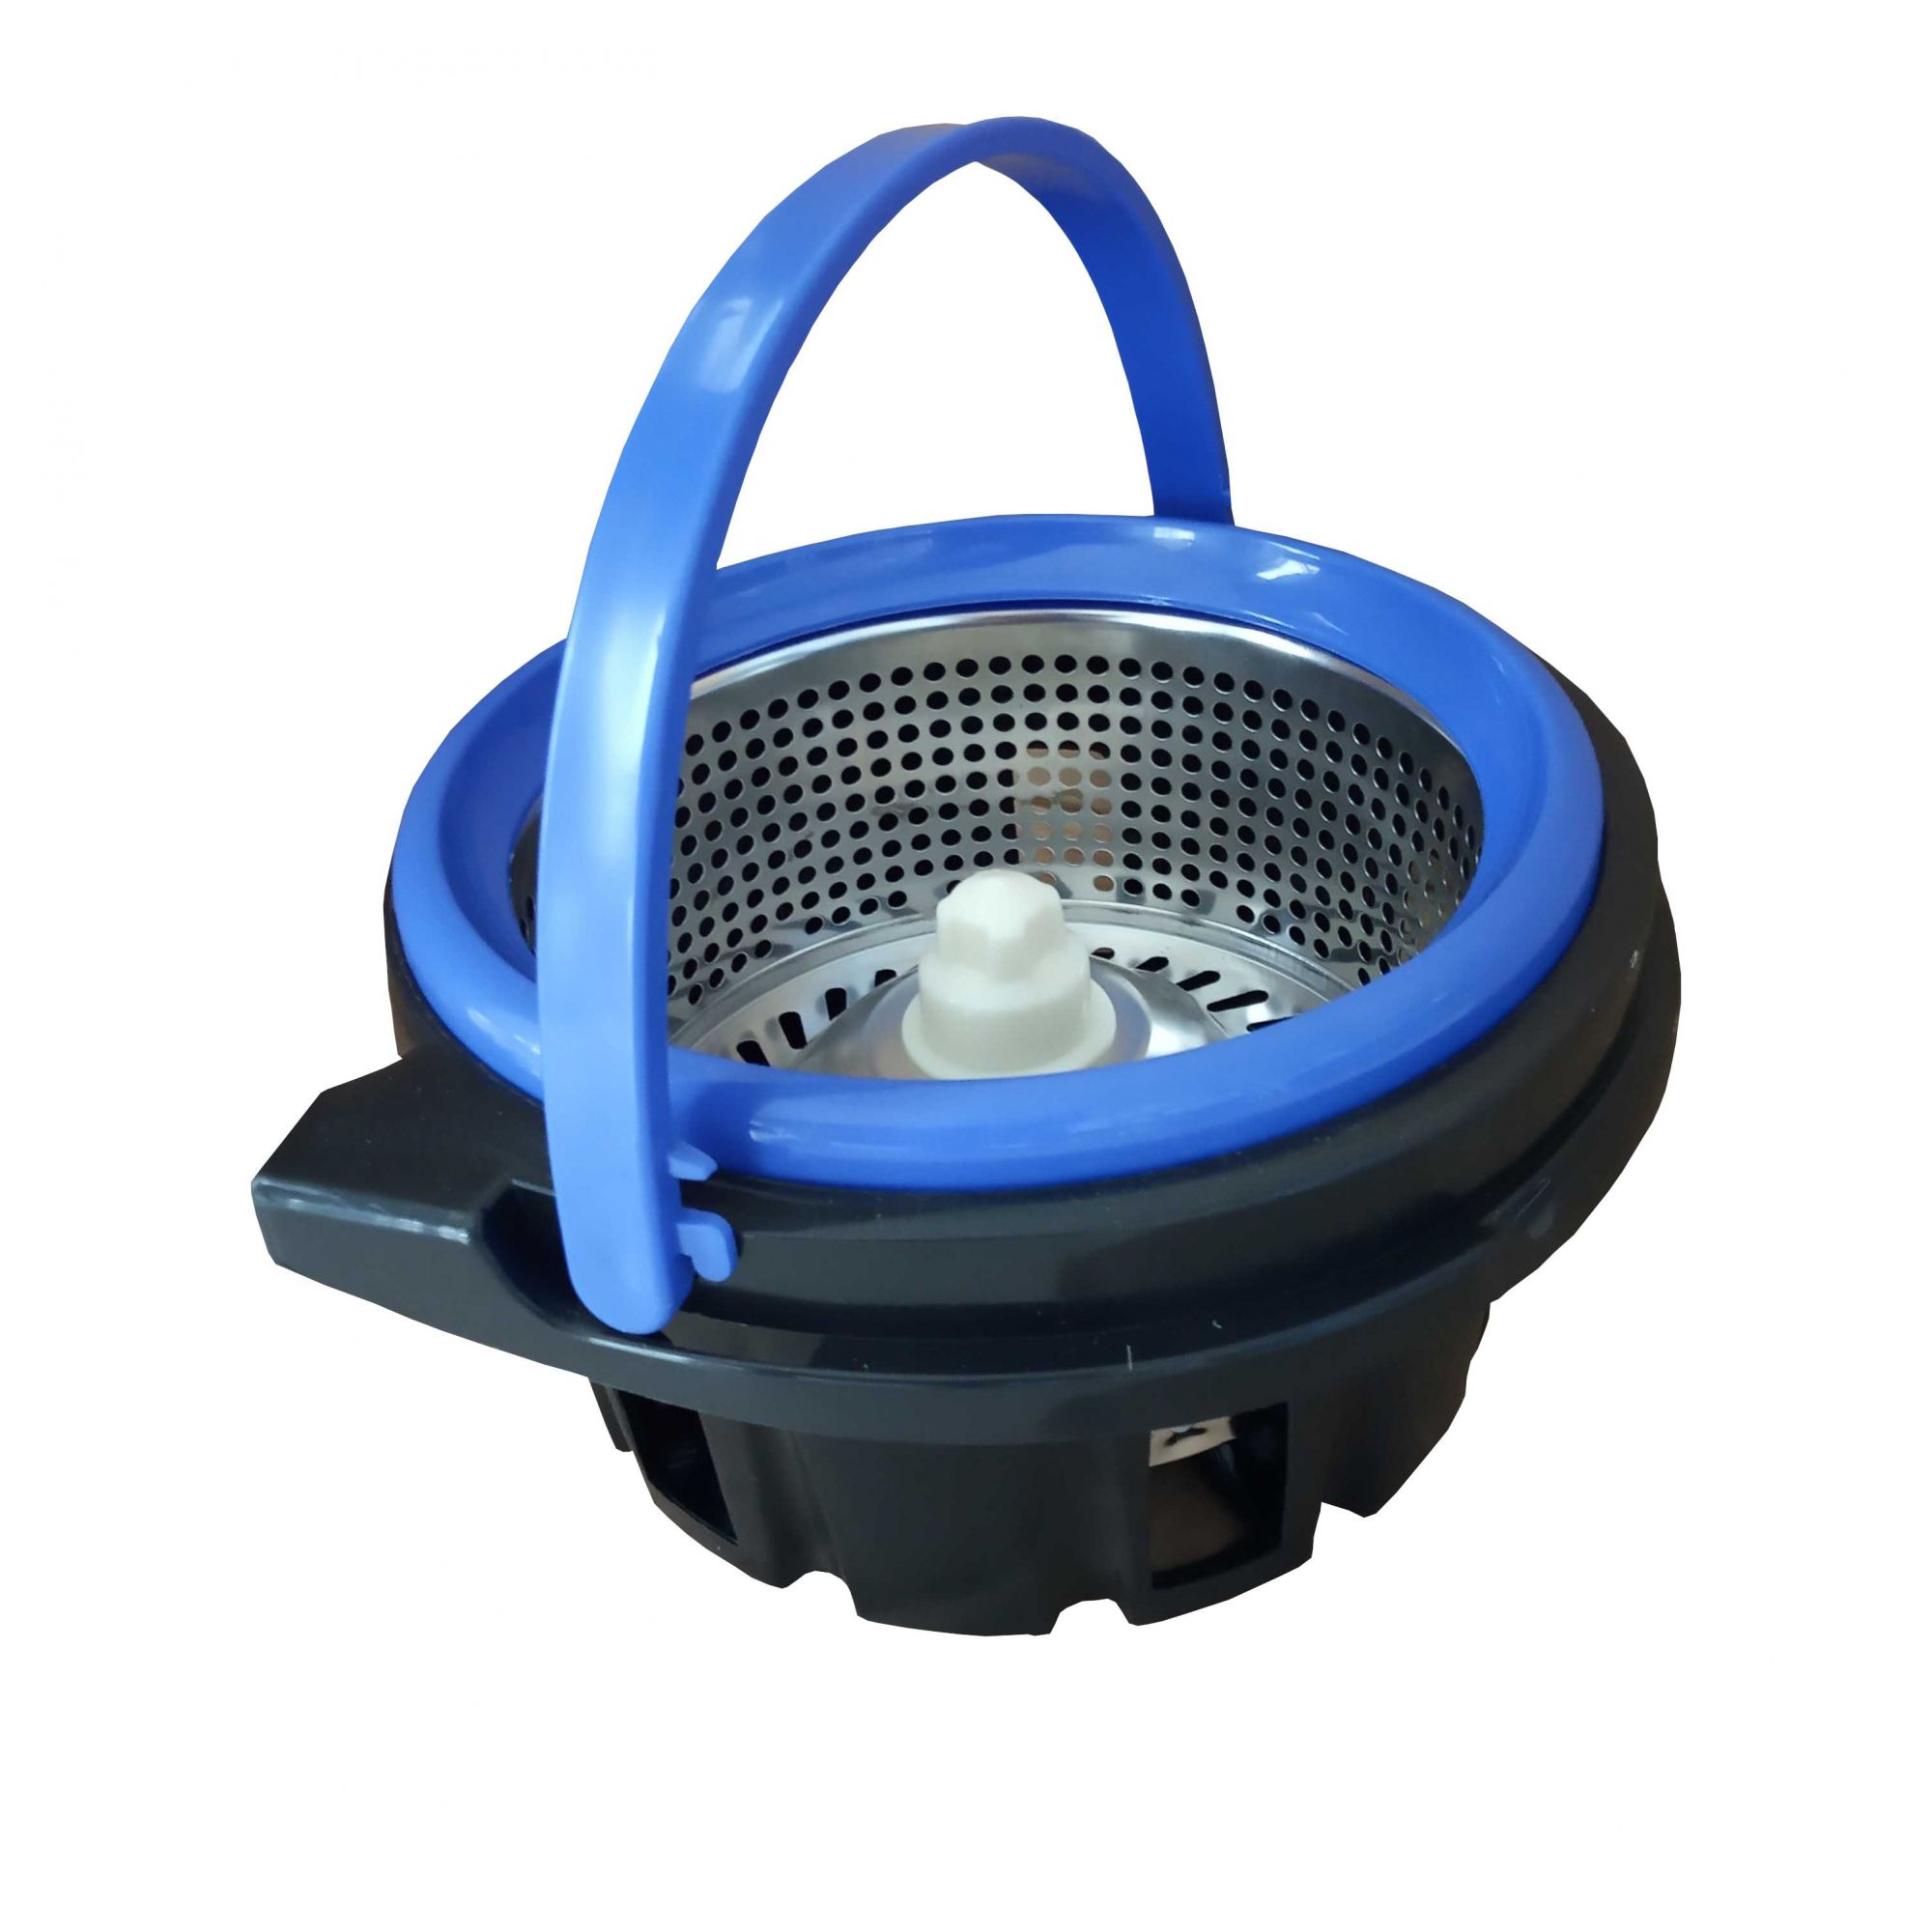 Cesto Inox Perfect Mop 360 removível